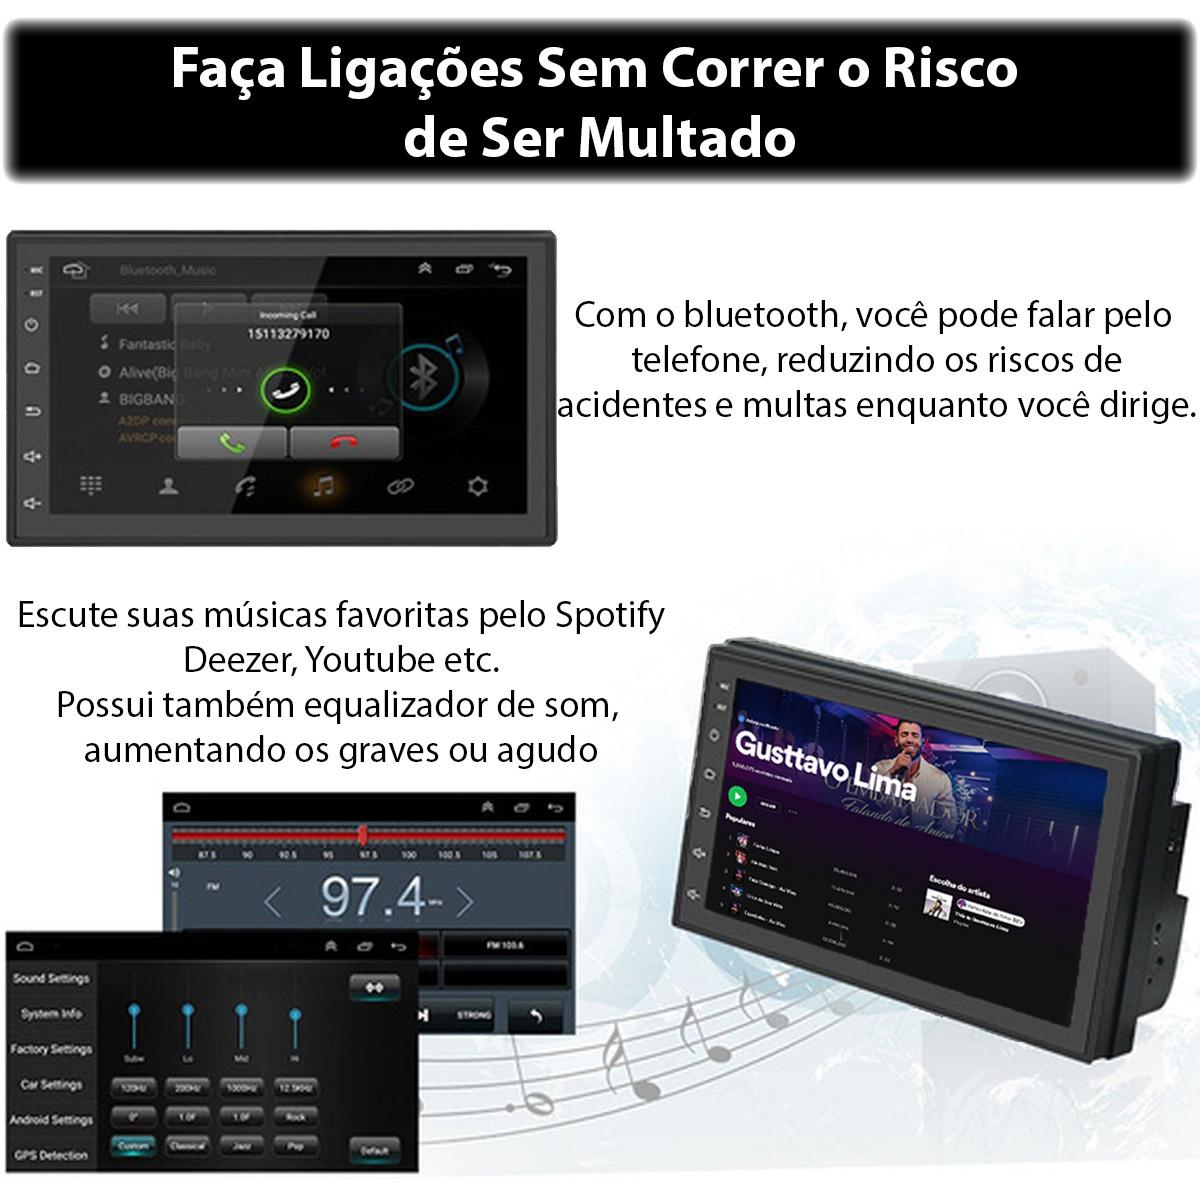 Central Multimídia Chevrolet Onix Muzik Android com Câmera 9 Polegadas 2 Din Moldura Poliparts